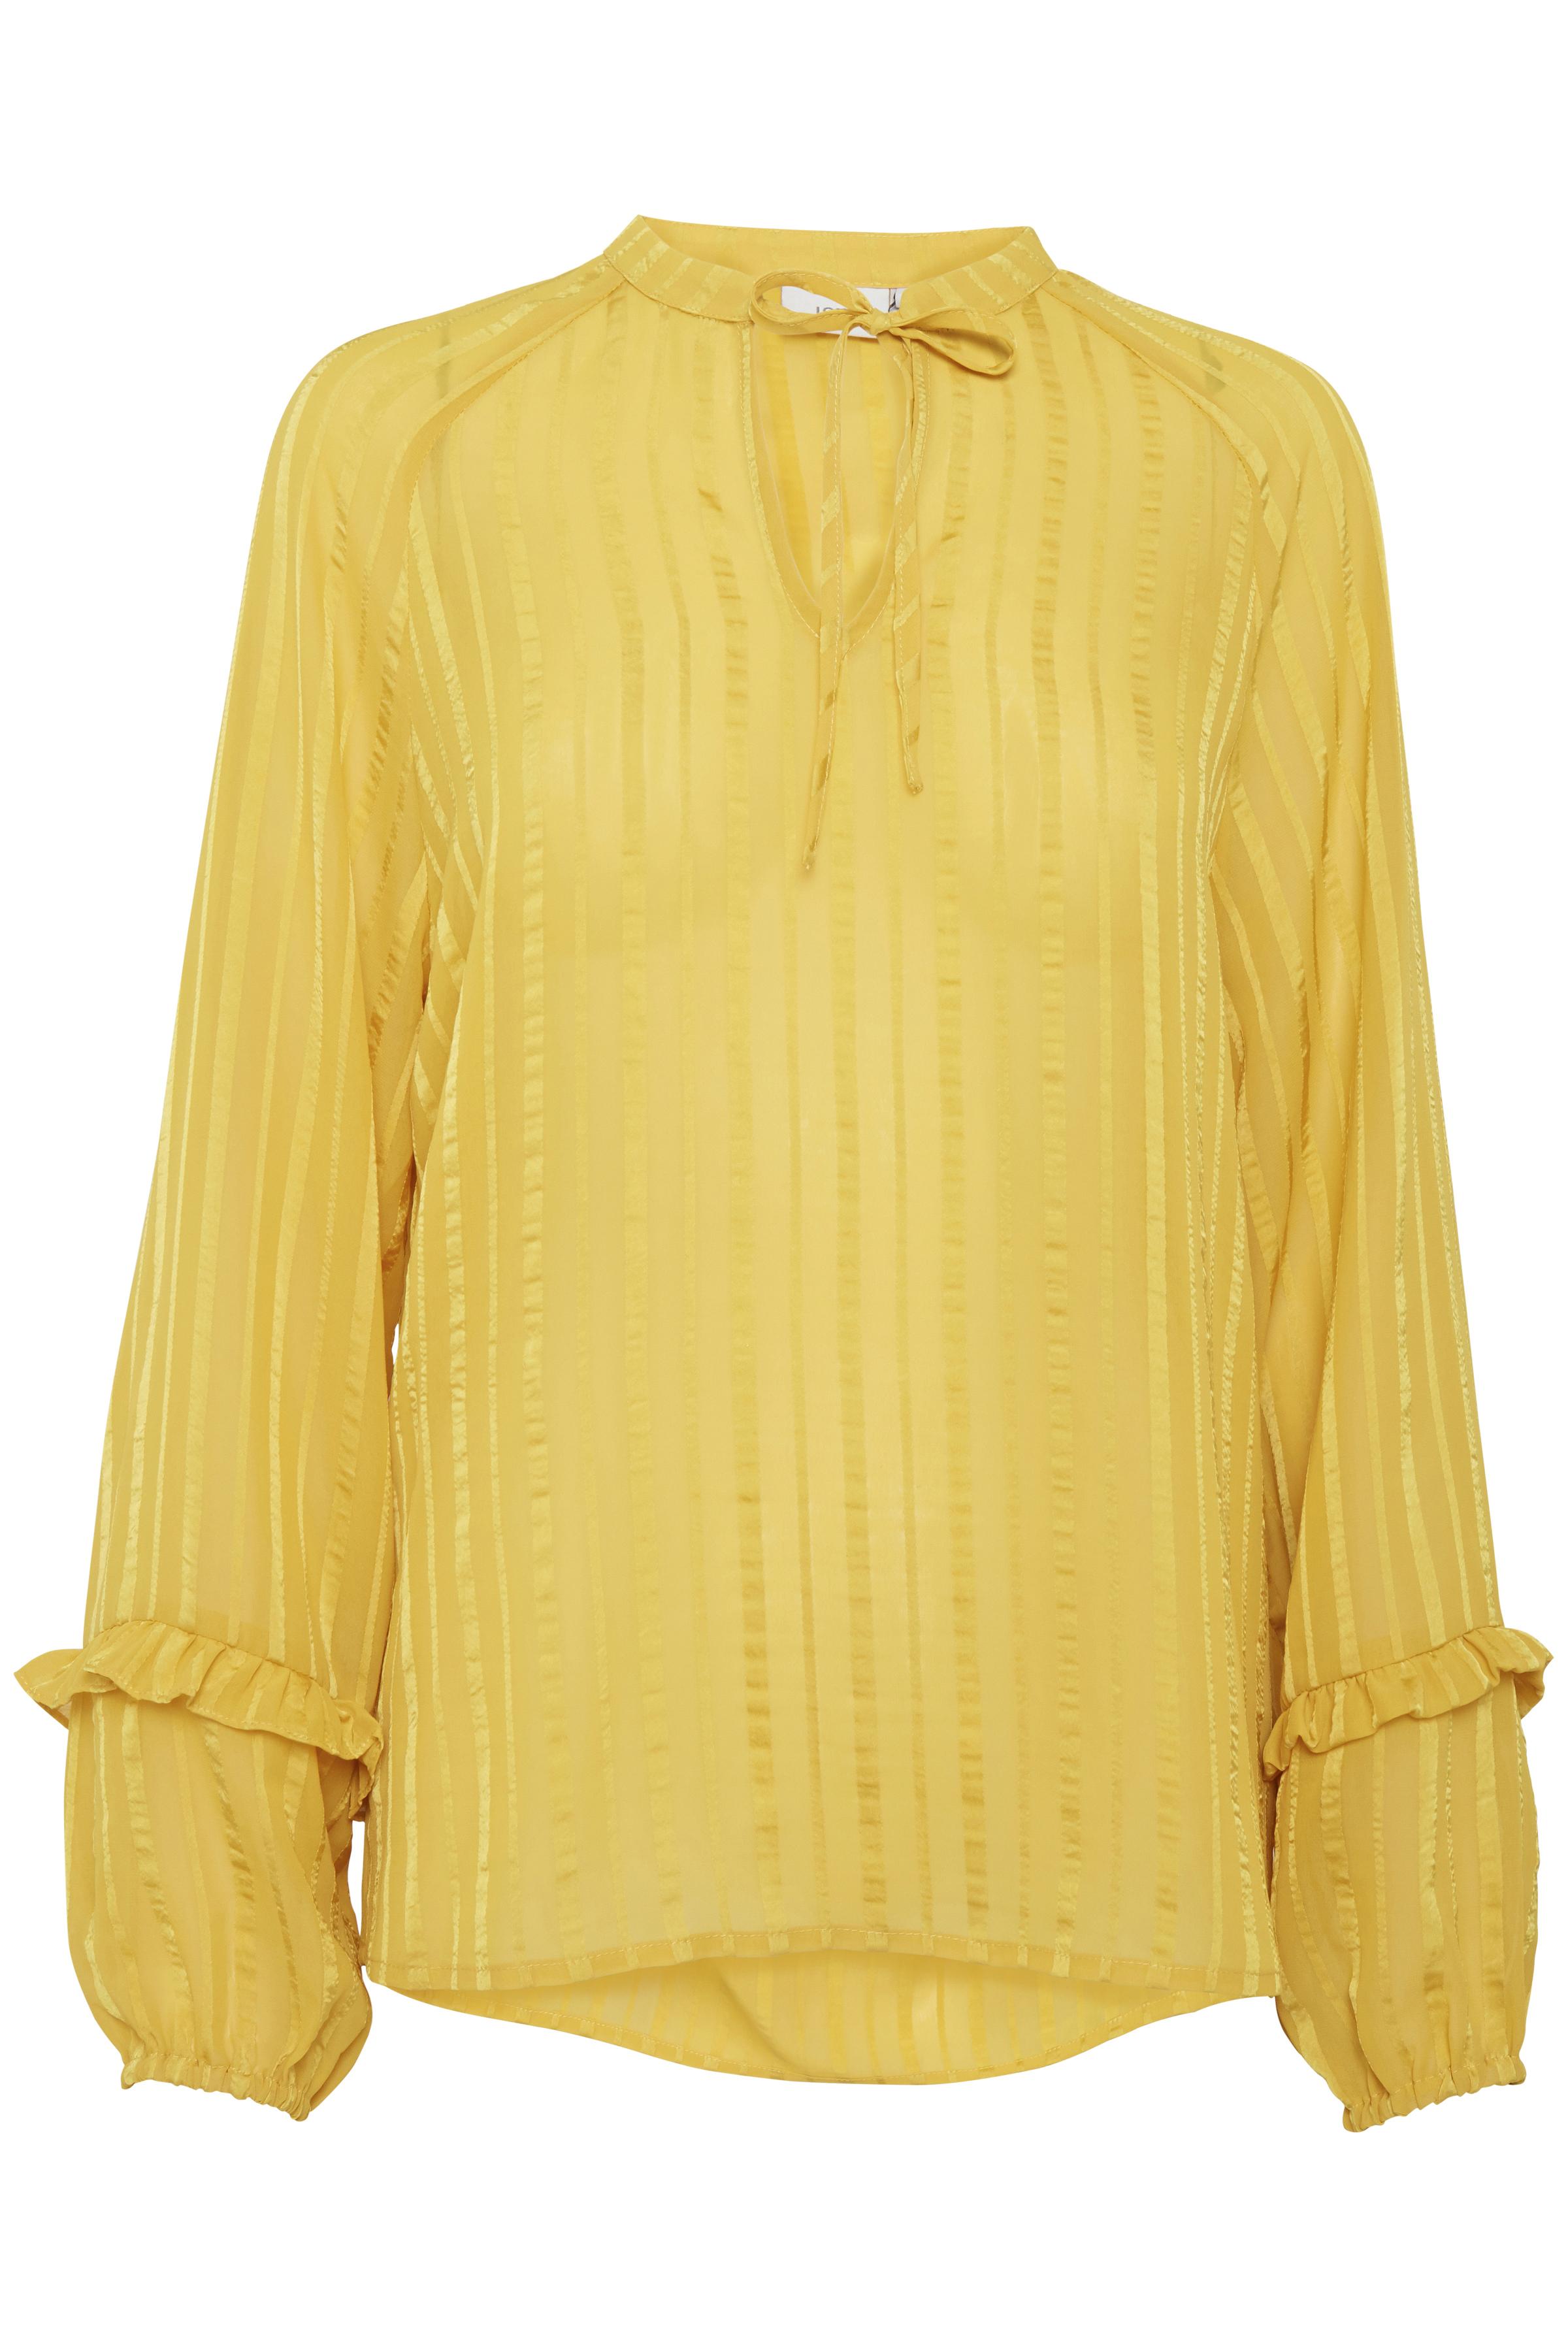 Yolk Yellow